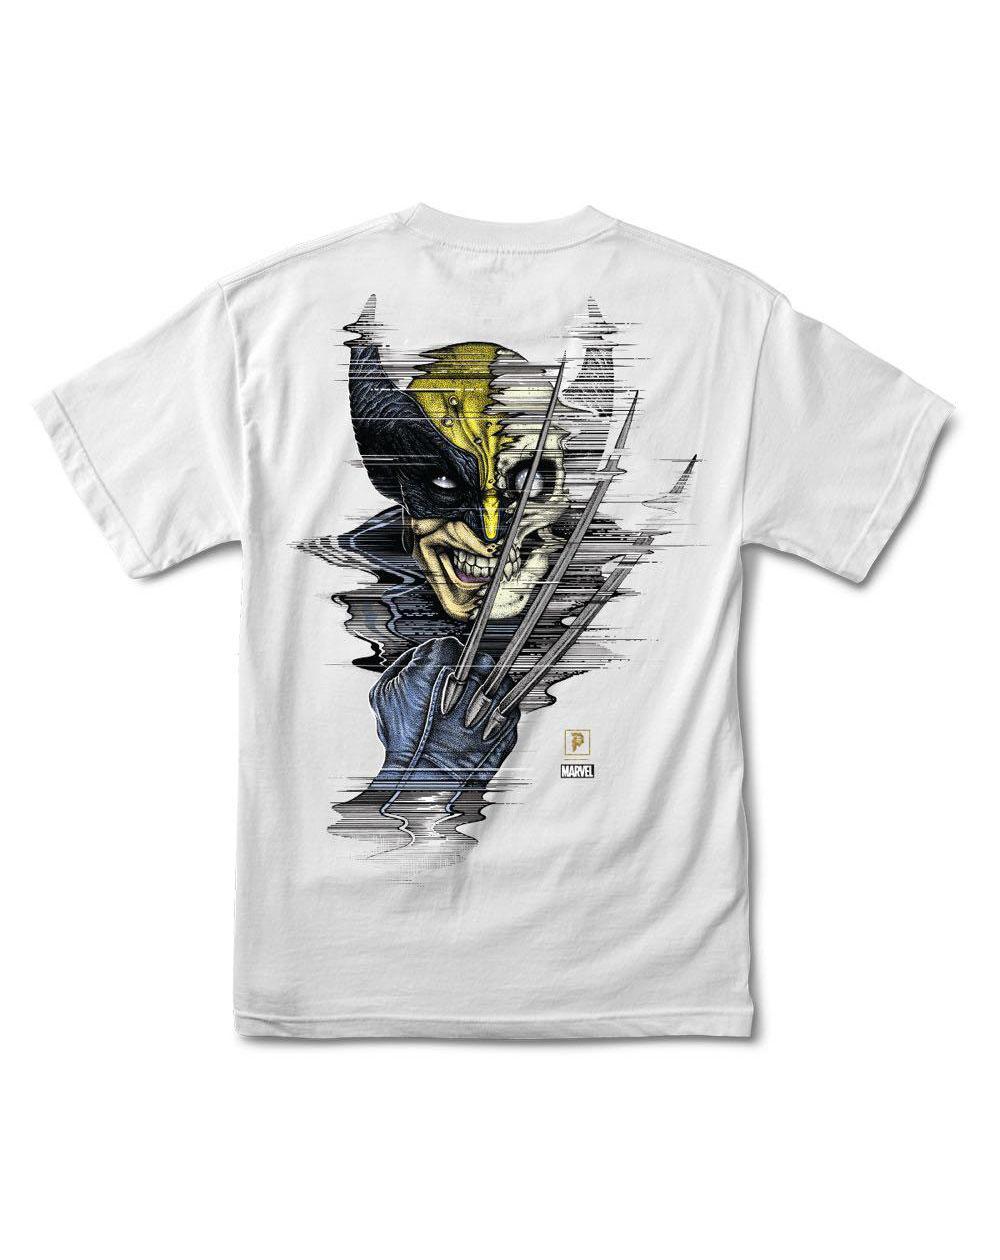 Primitive Paul Jackson x Marvel - Wolverine T-Shirt Uomo White